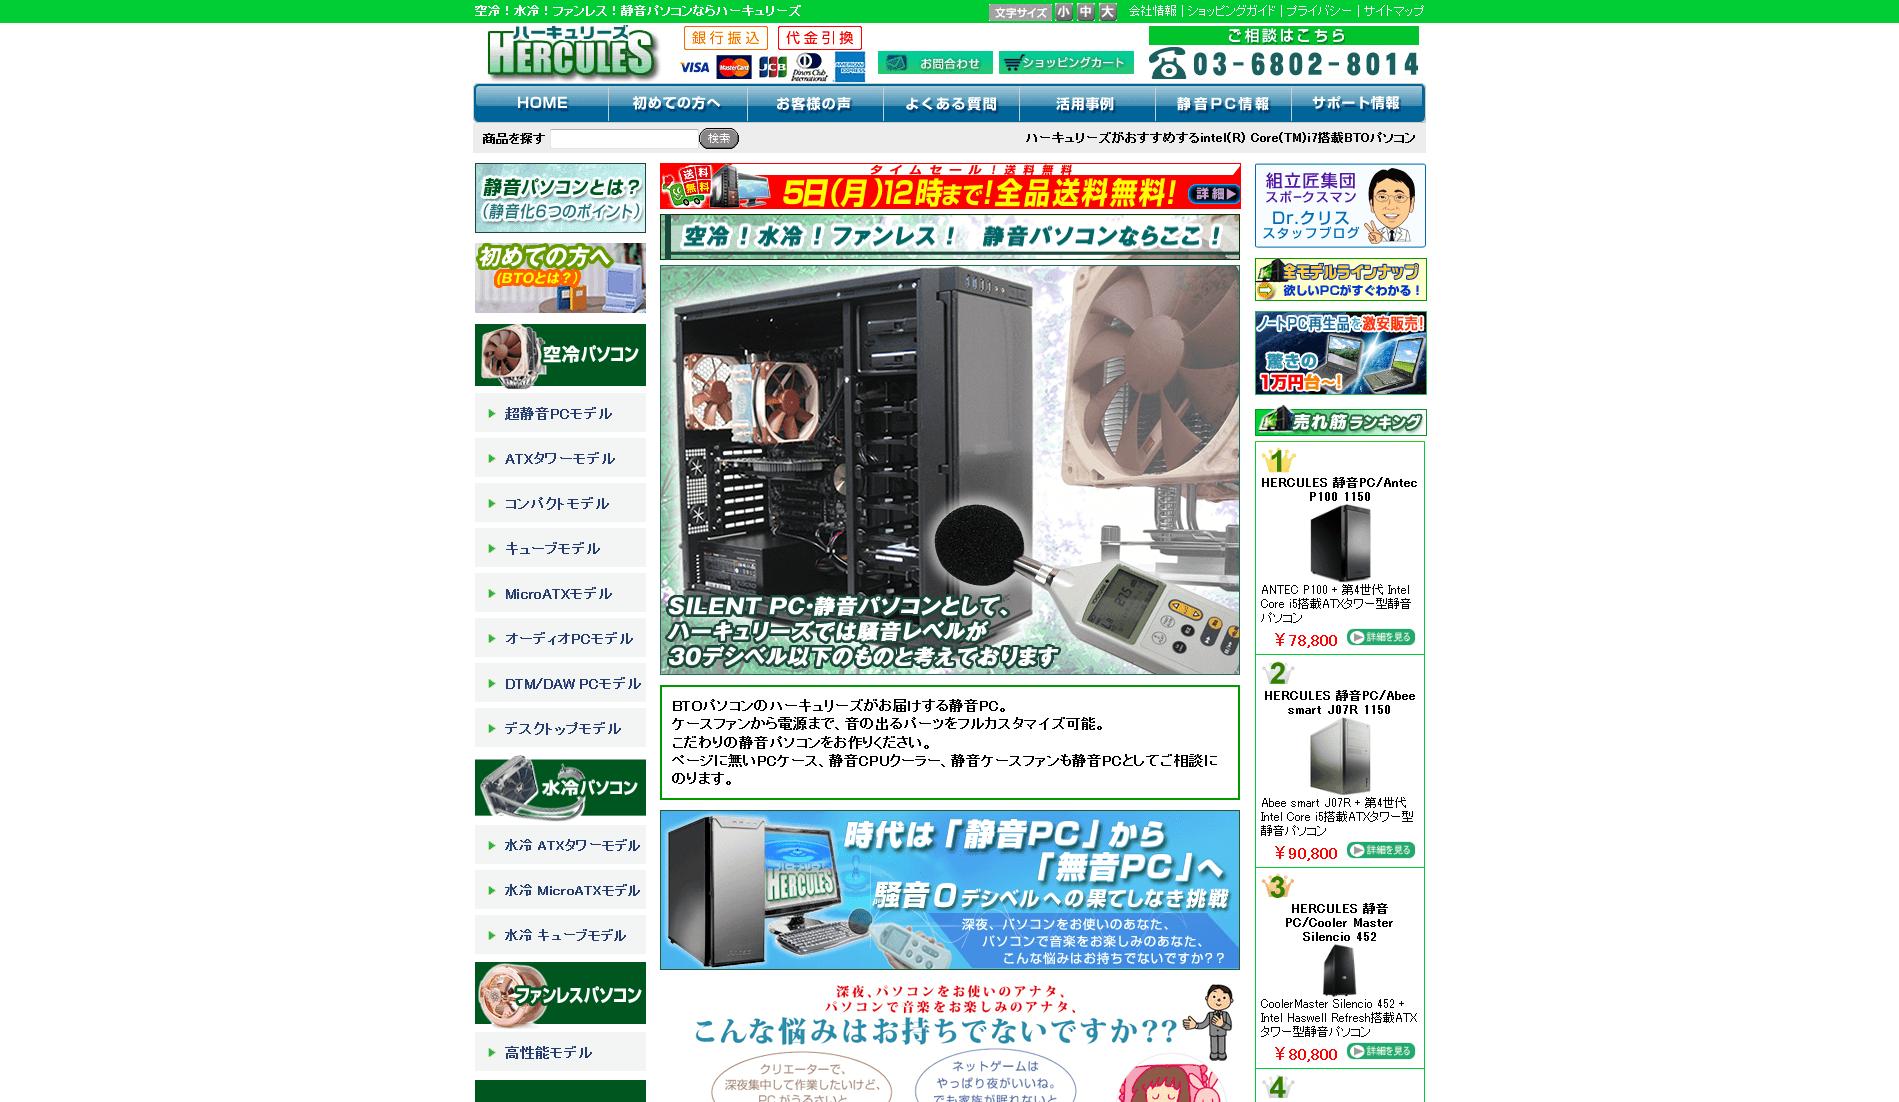 BTO静音パソコンのハーキュリーズ-BTO静音パソコン(PC)販売